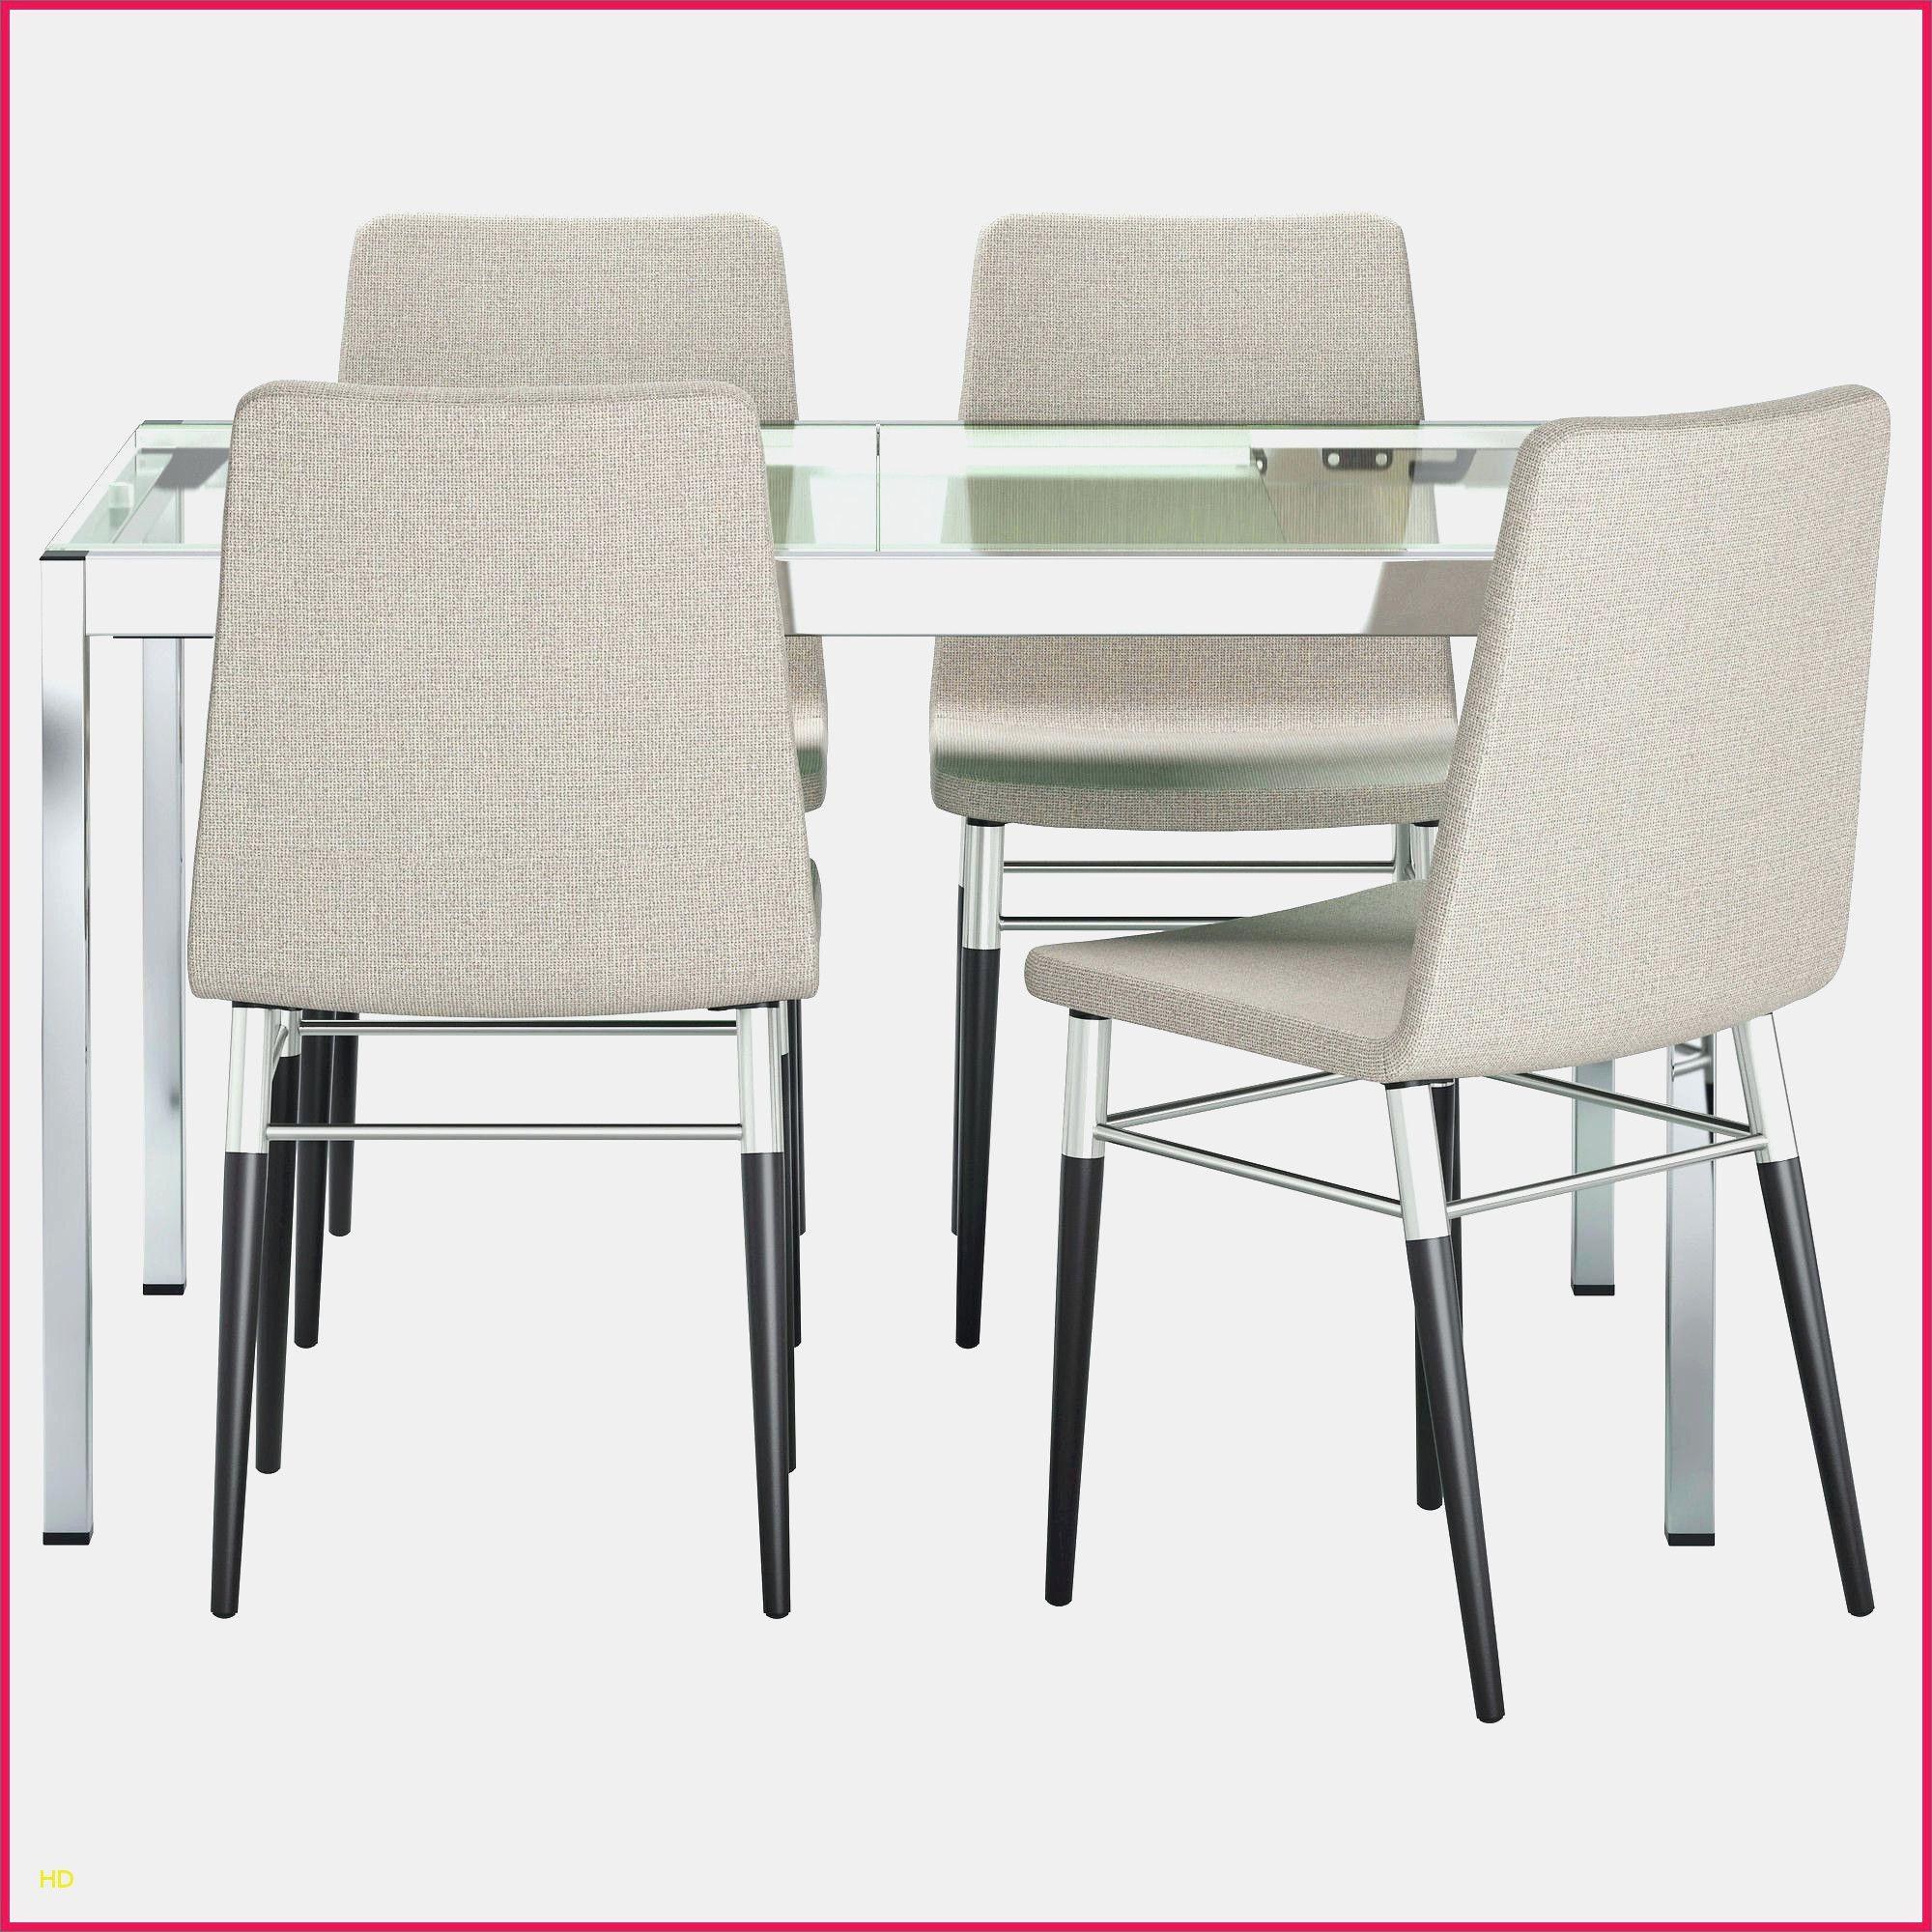 meuble de jardin hesperide ou frais chaise terrasse ikea de meuble de jardin hesperide